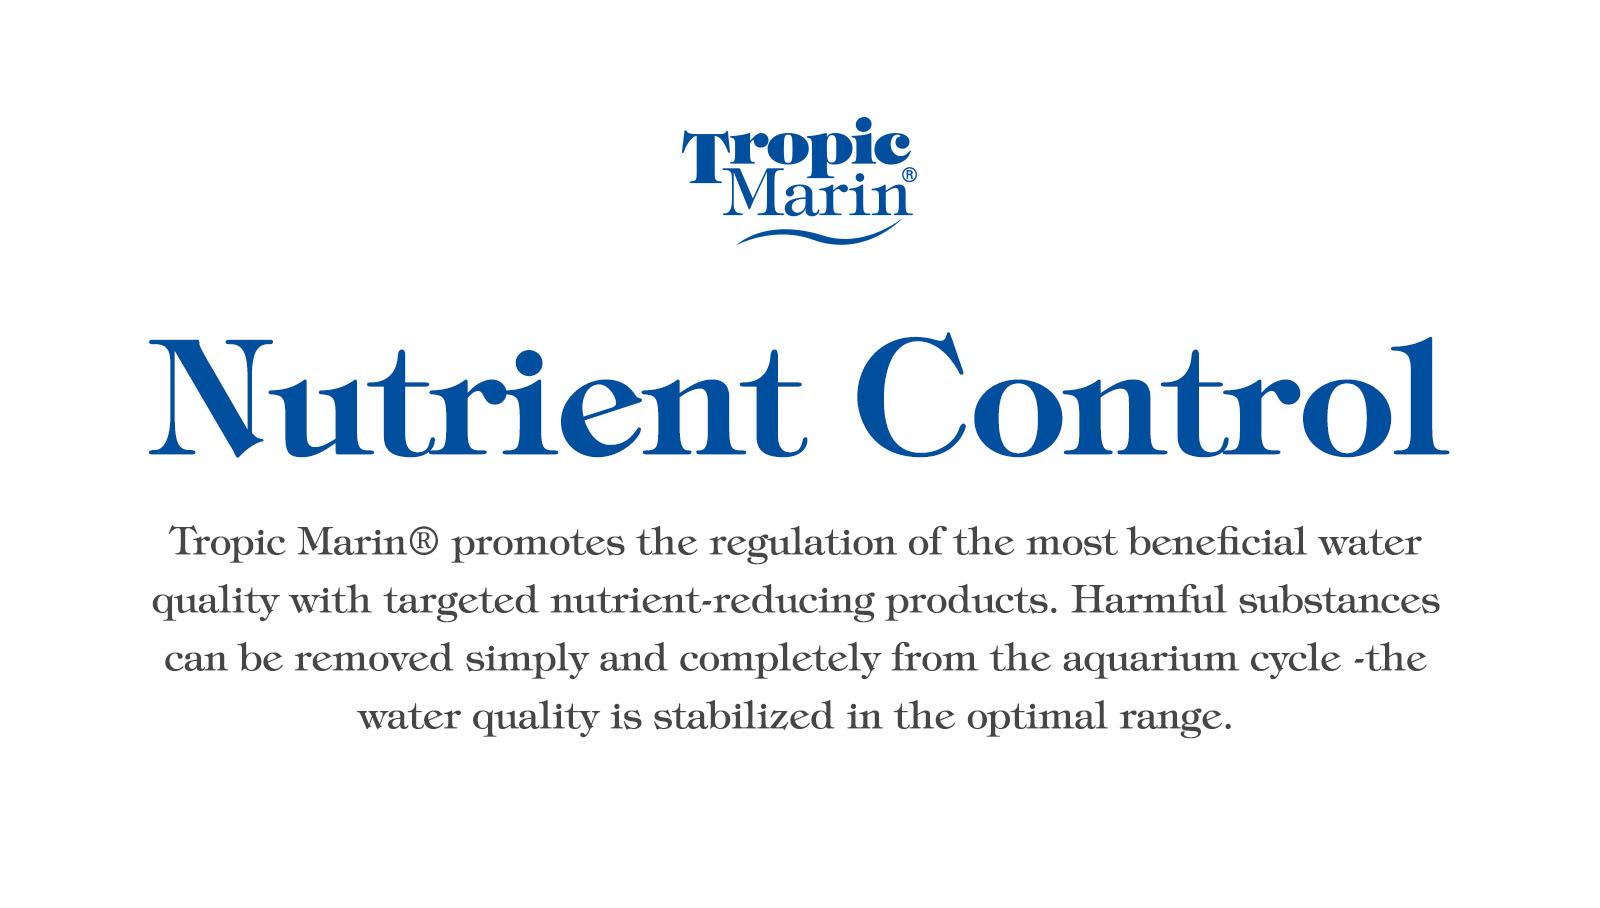 Tropic Marin Nutrient Control